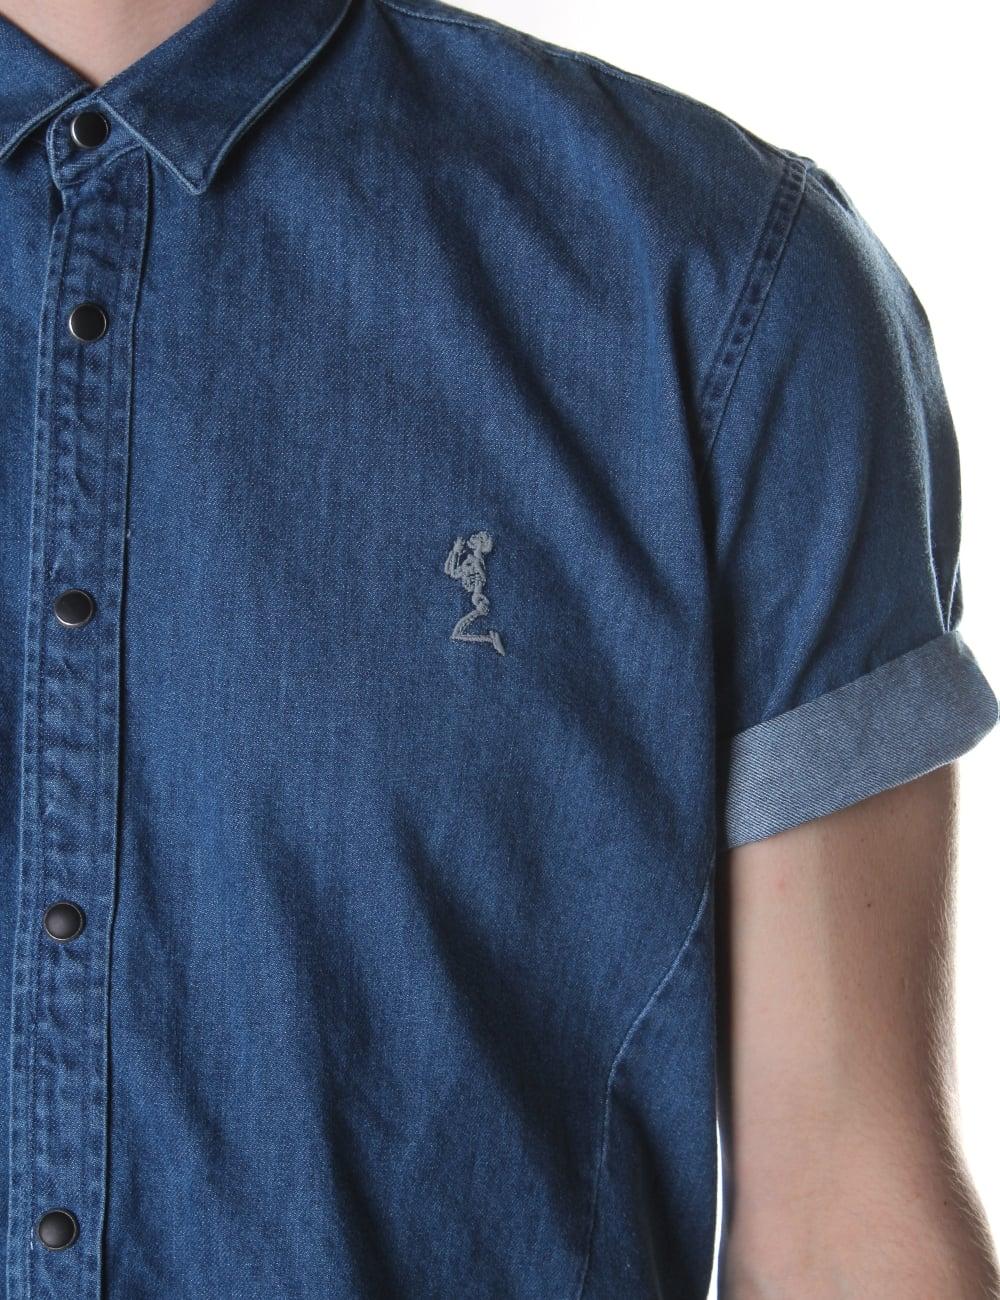 b114fcee9f Religion Disturb Men s Short Sleeve Denim Shirt